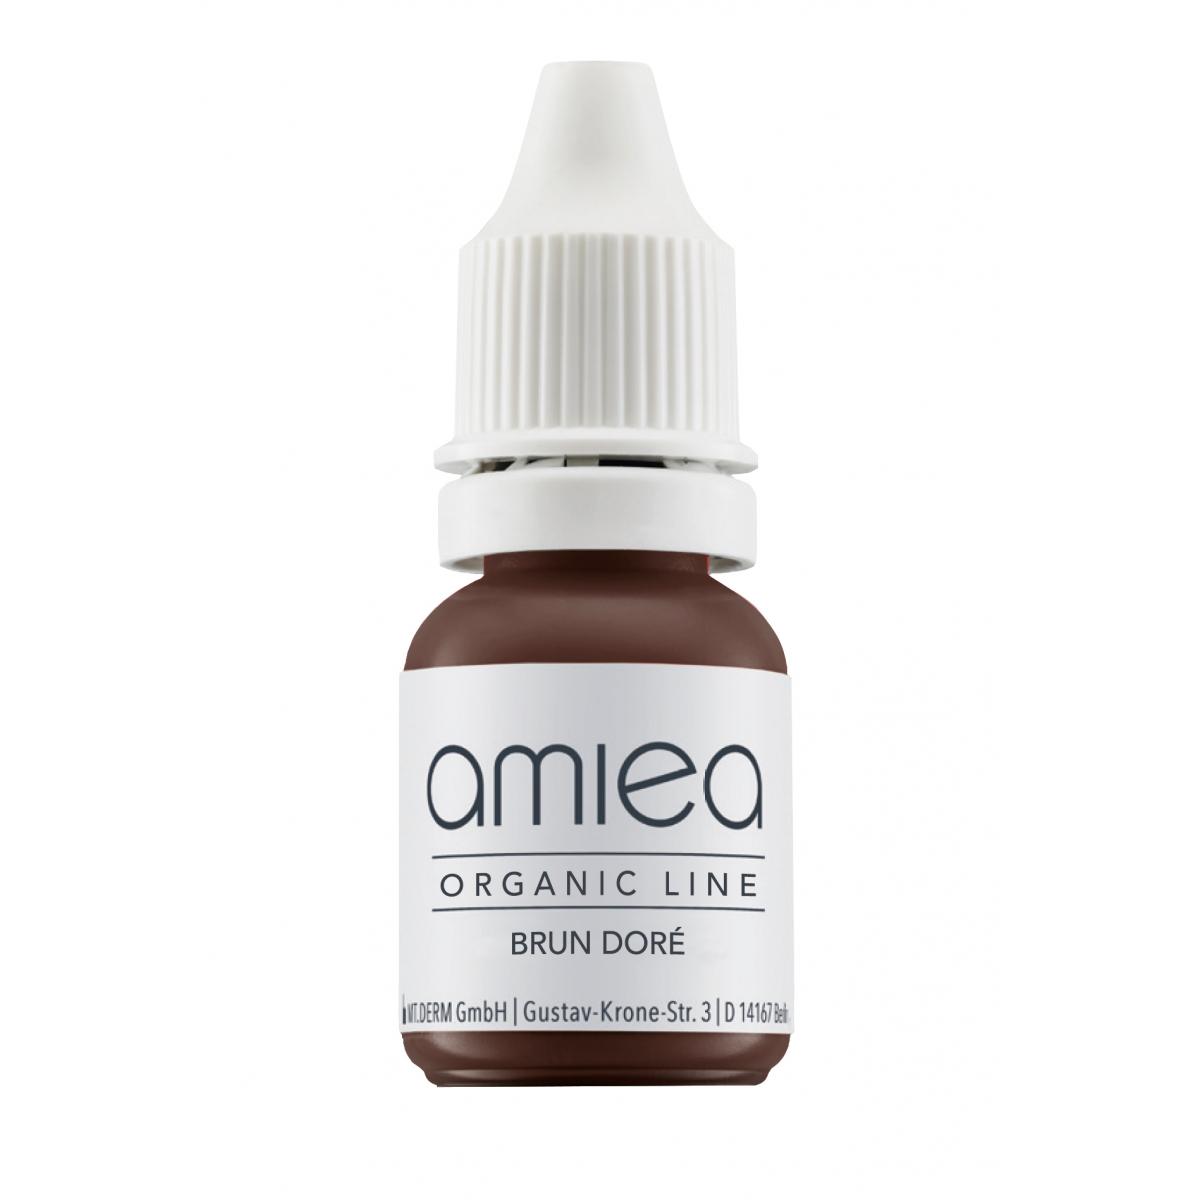 ORGANIC LINE (10ml) - PIGMENT BRUN DORE ORGANICLINE AMIEA (10 ml)